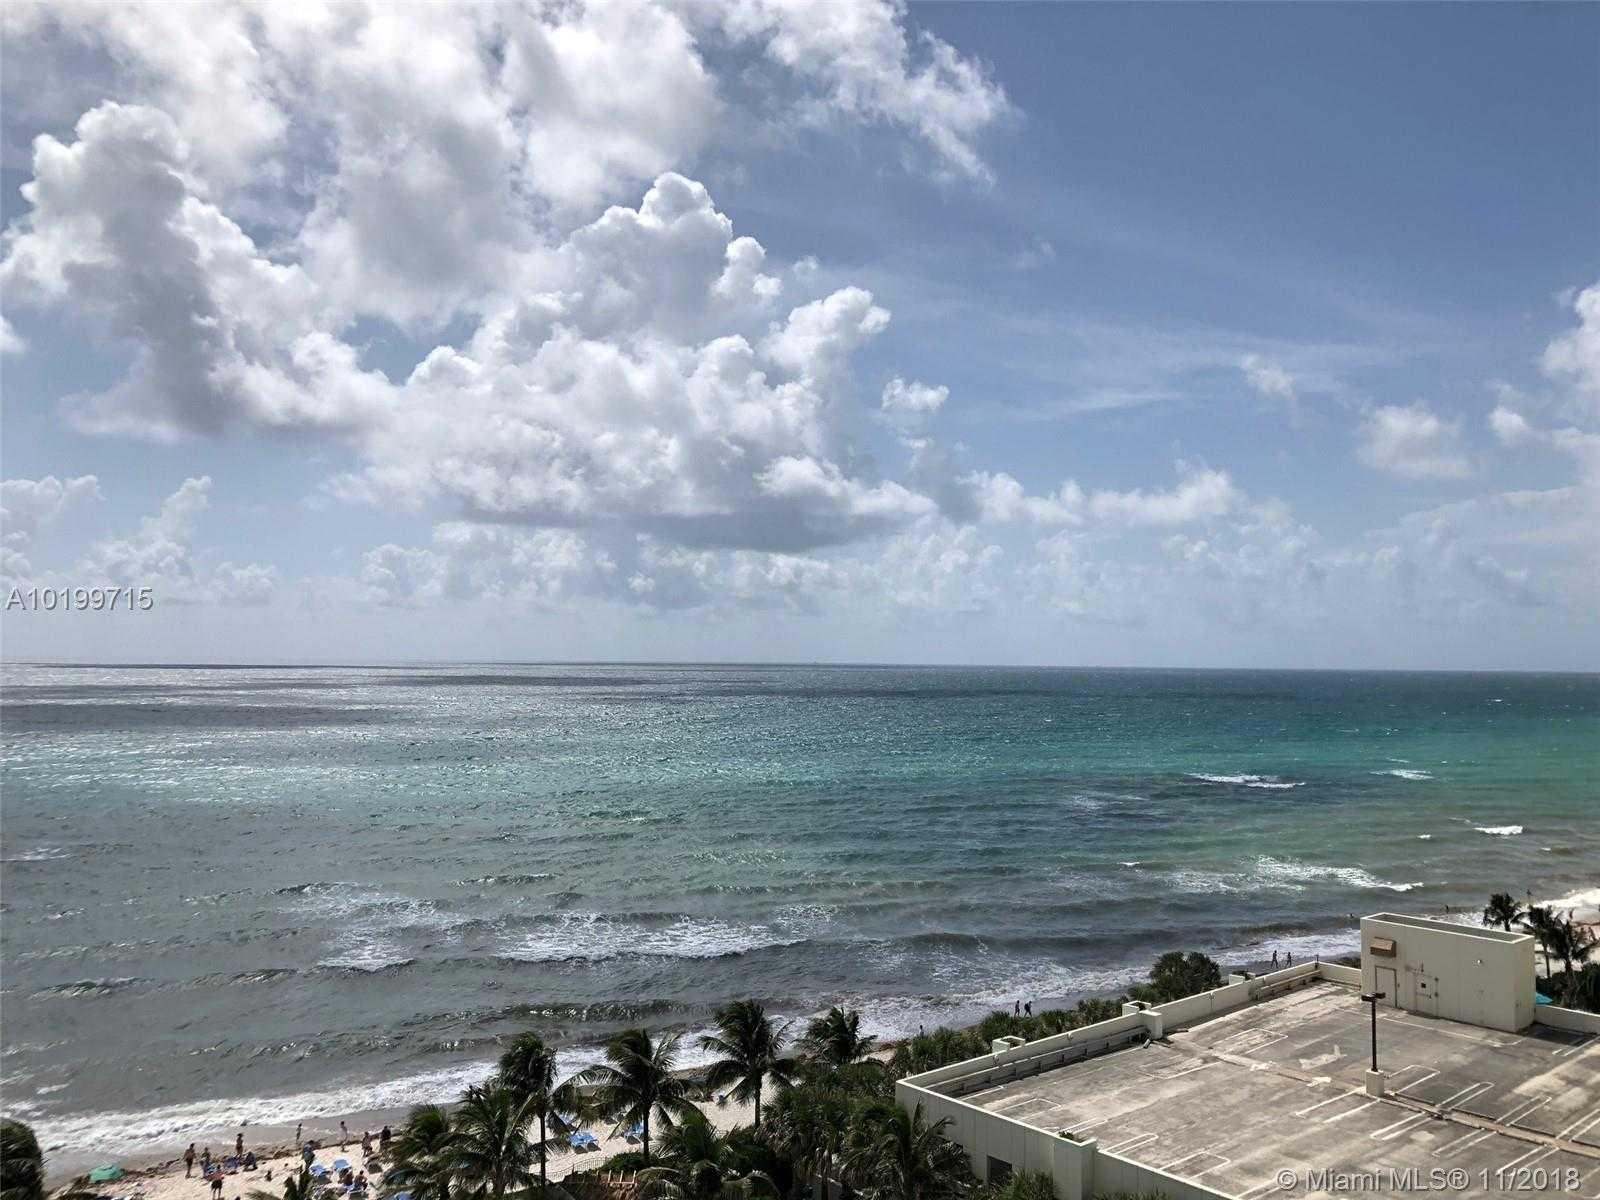 MLS A10199715   3801 Ocean Dr Unit 10h Hollywood FL 33019 1600x1200